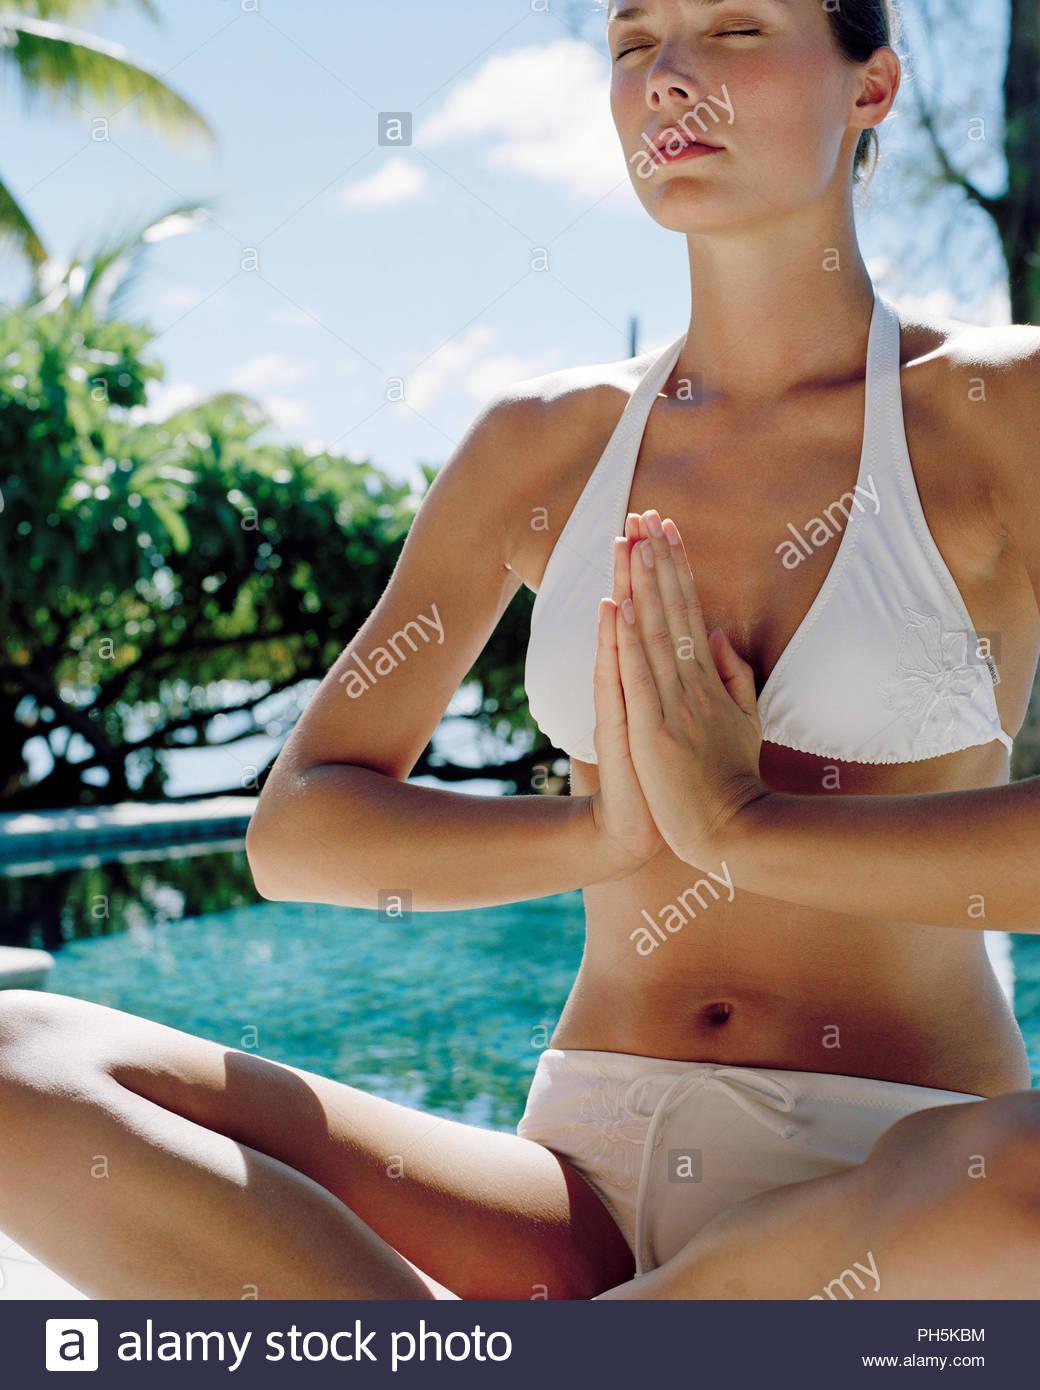 Woman meditating beside swimming pool. - Stock Image